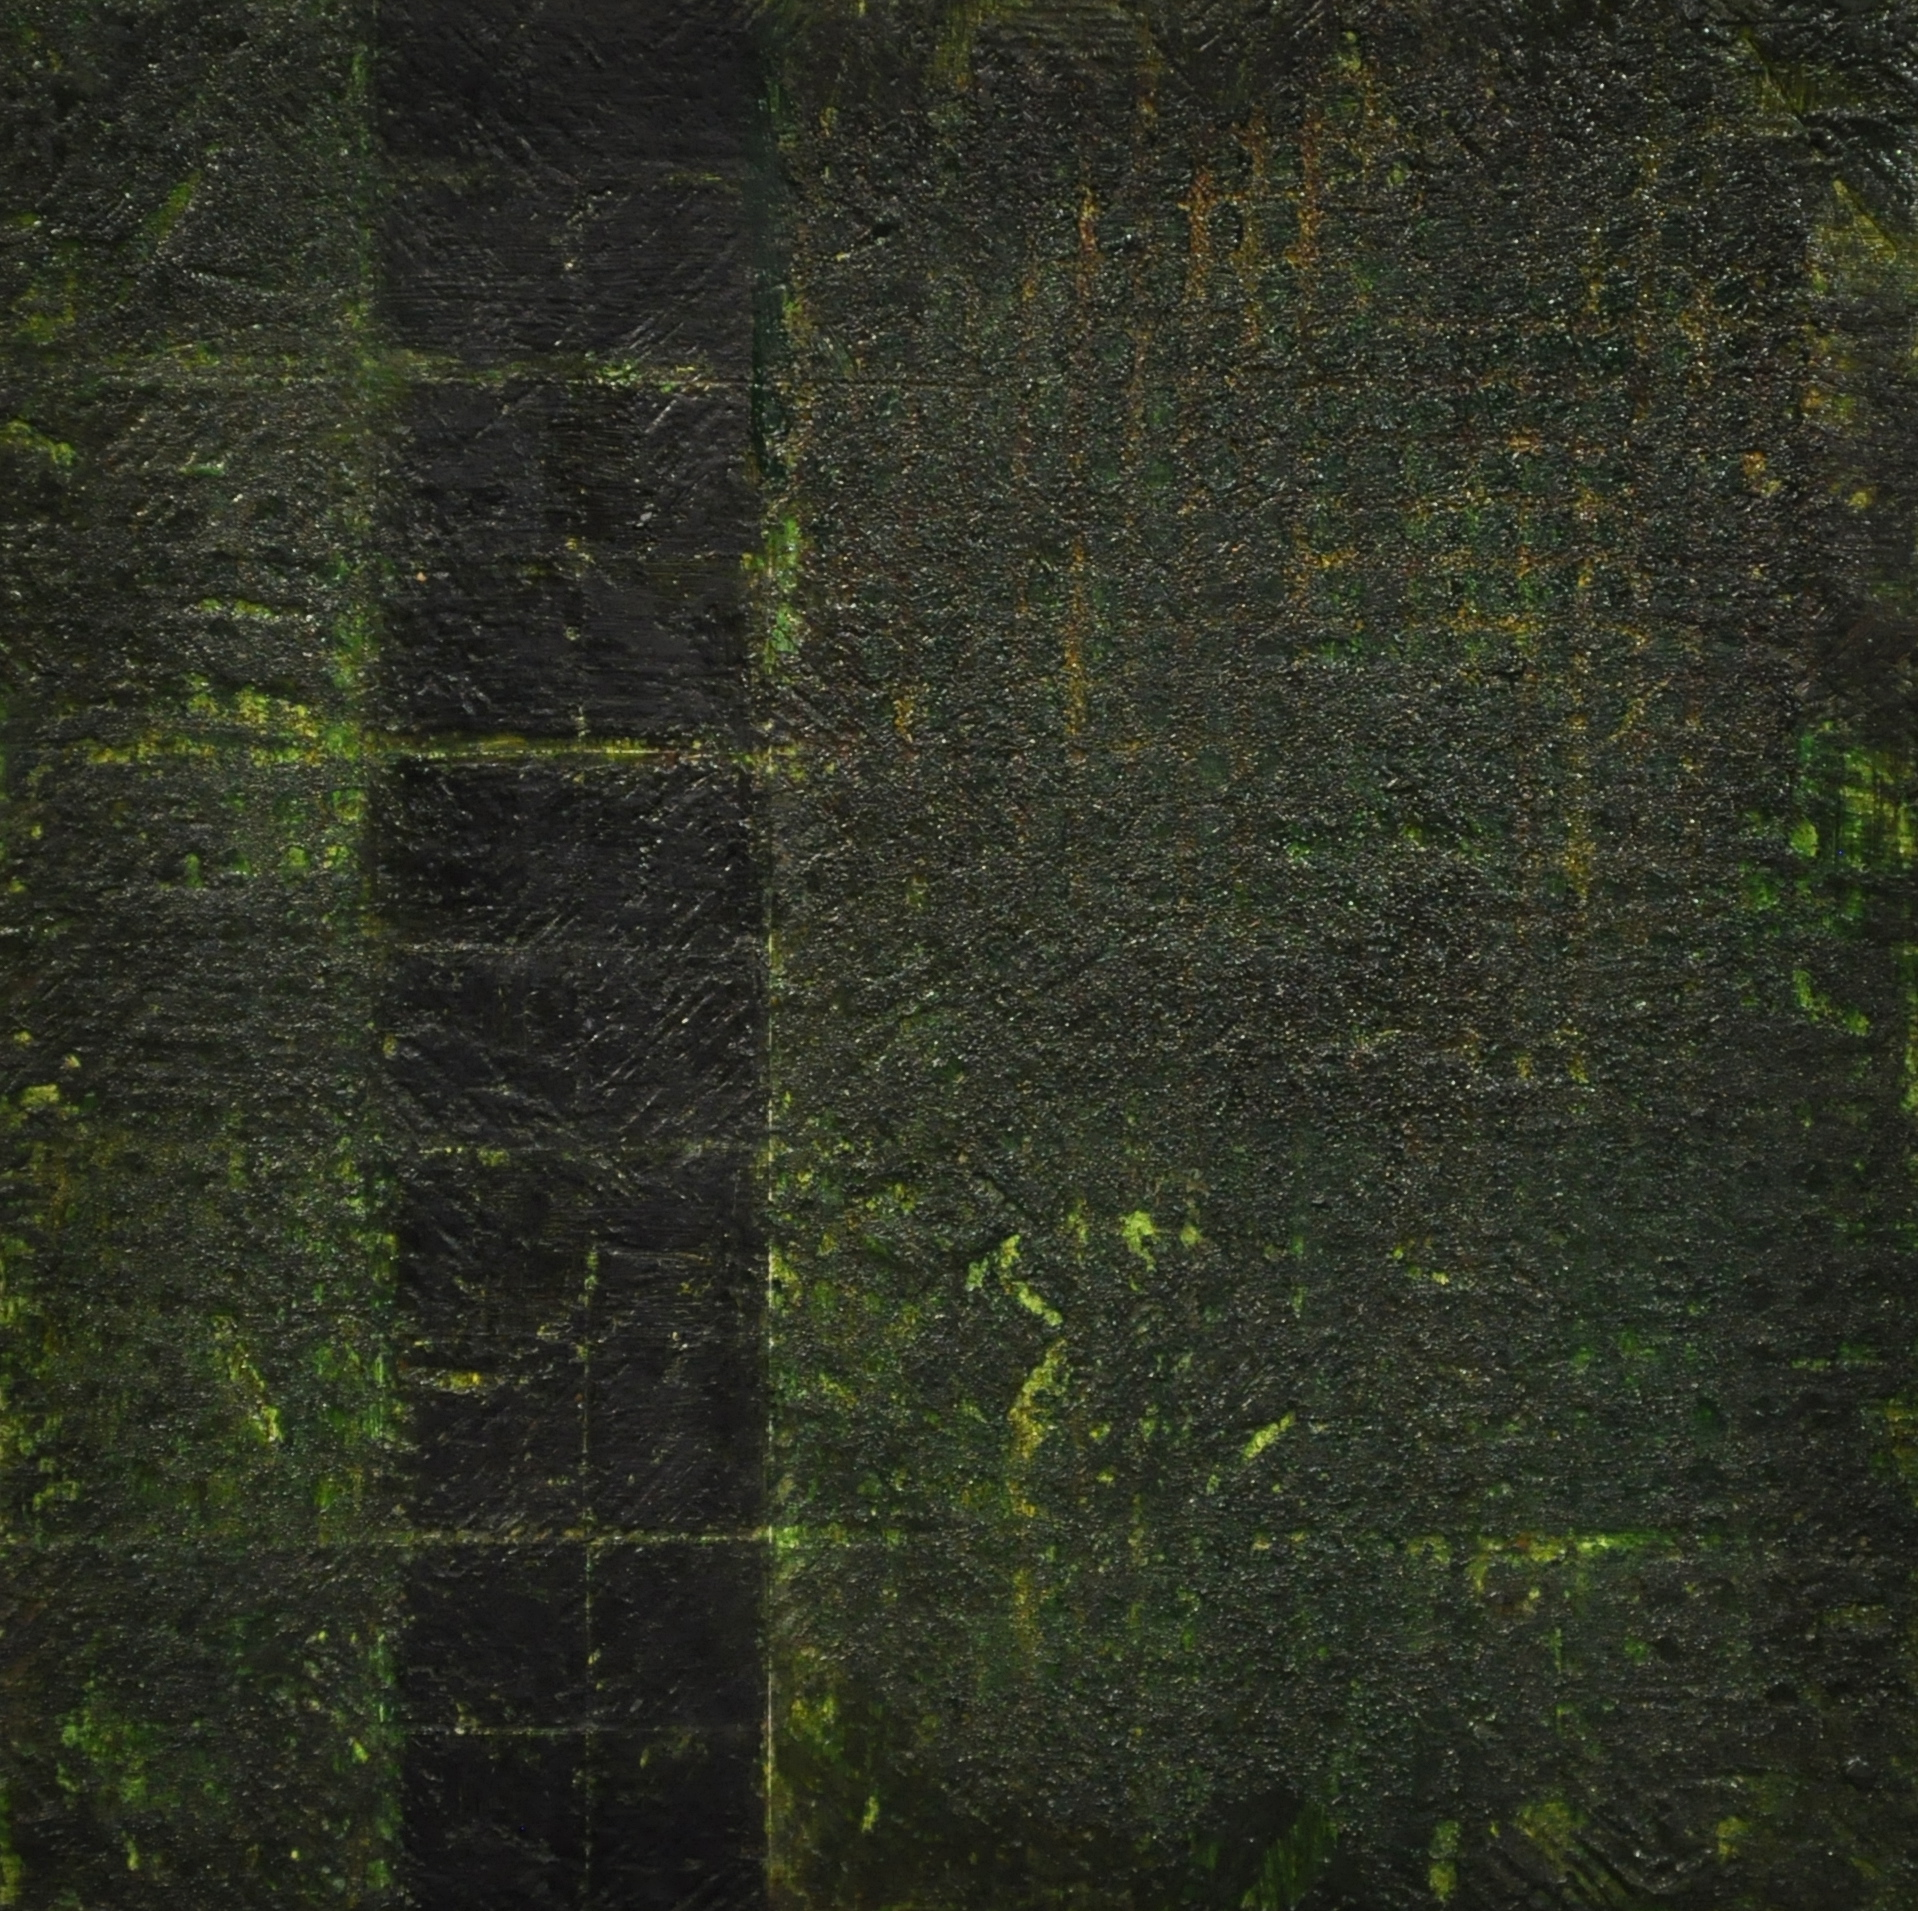 land divide, 2016 oil on panel, 12.5 x 12.5 cm